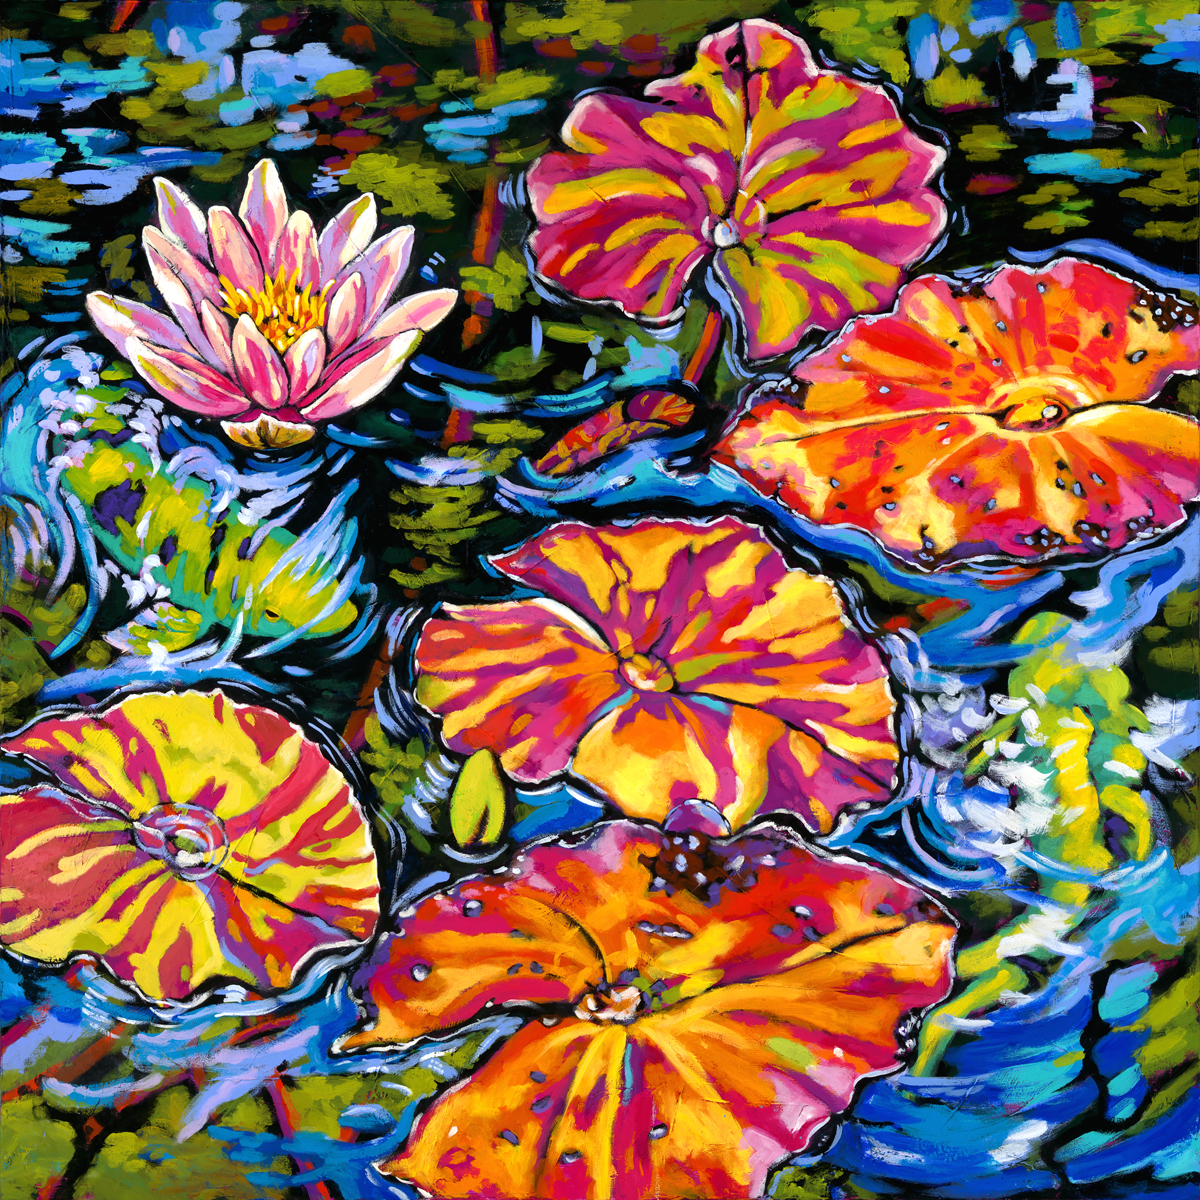 Lilies dance with koi rjmwis